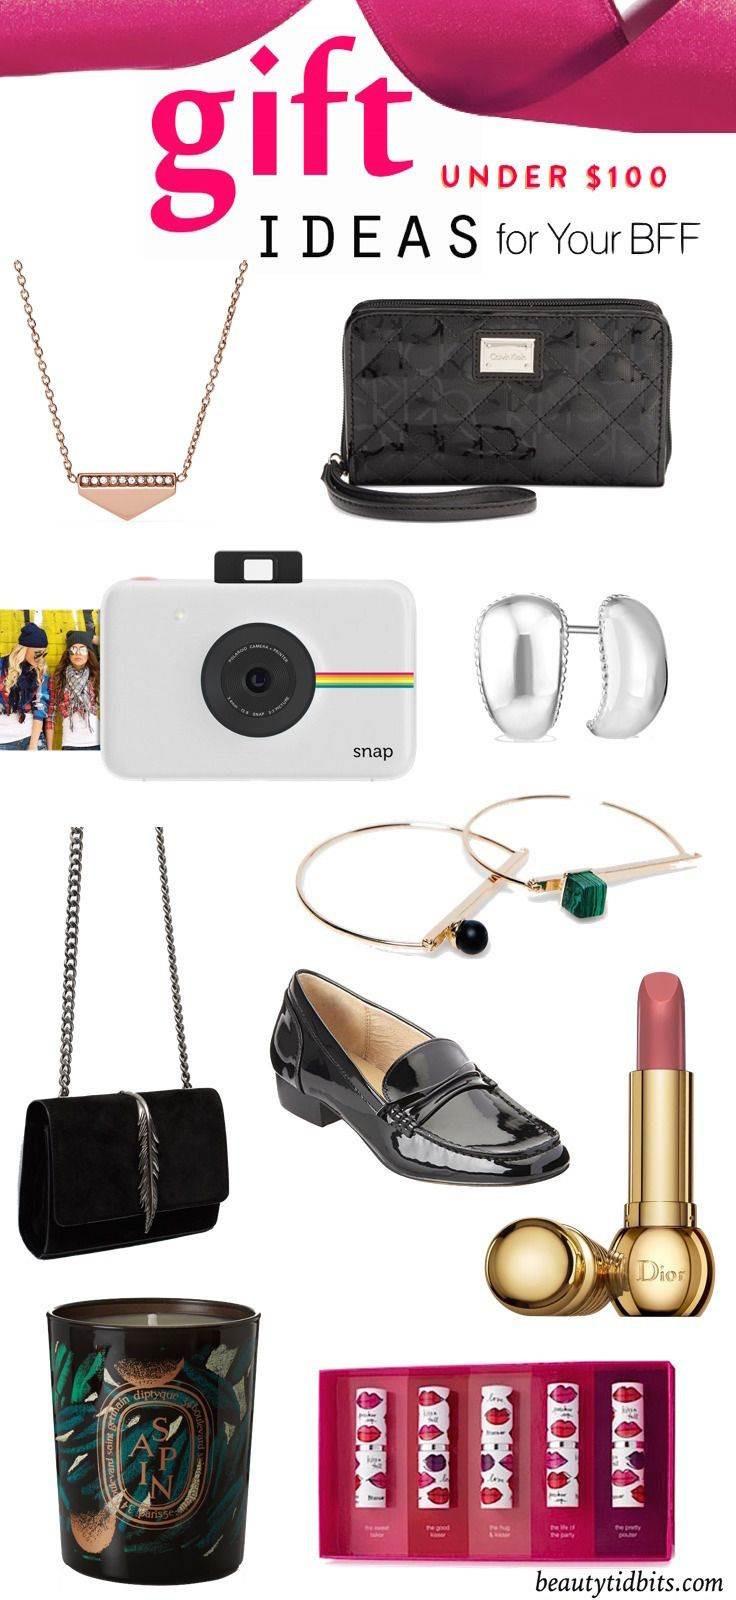 Best ideas about Girlfriend Gift Ideas Christmas . Save or Pin Christmas Gift Ideas for Girlfriend Unique Girlfriends Now.